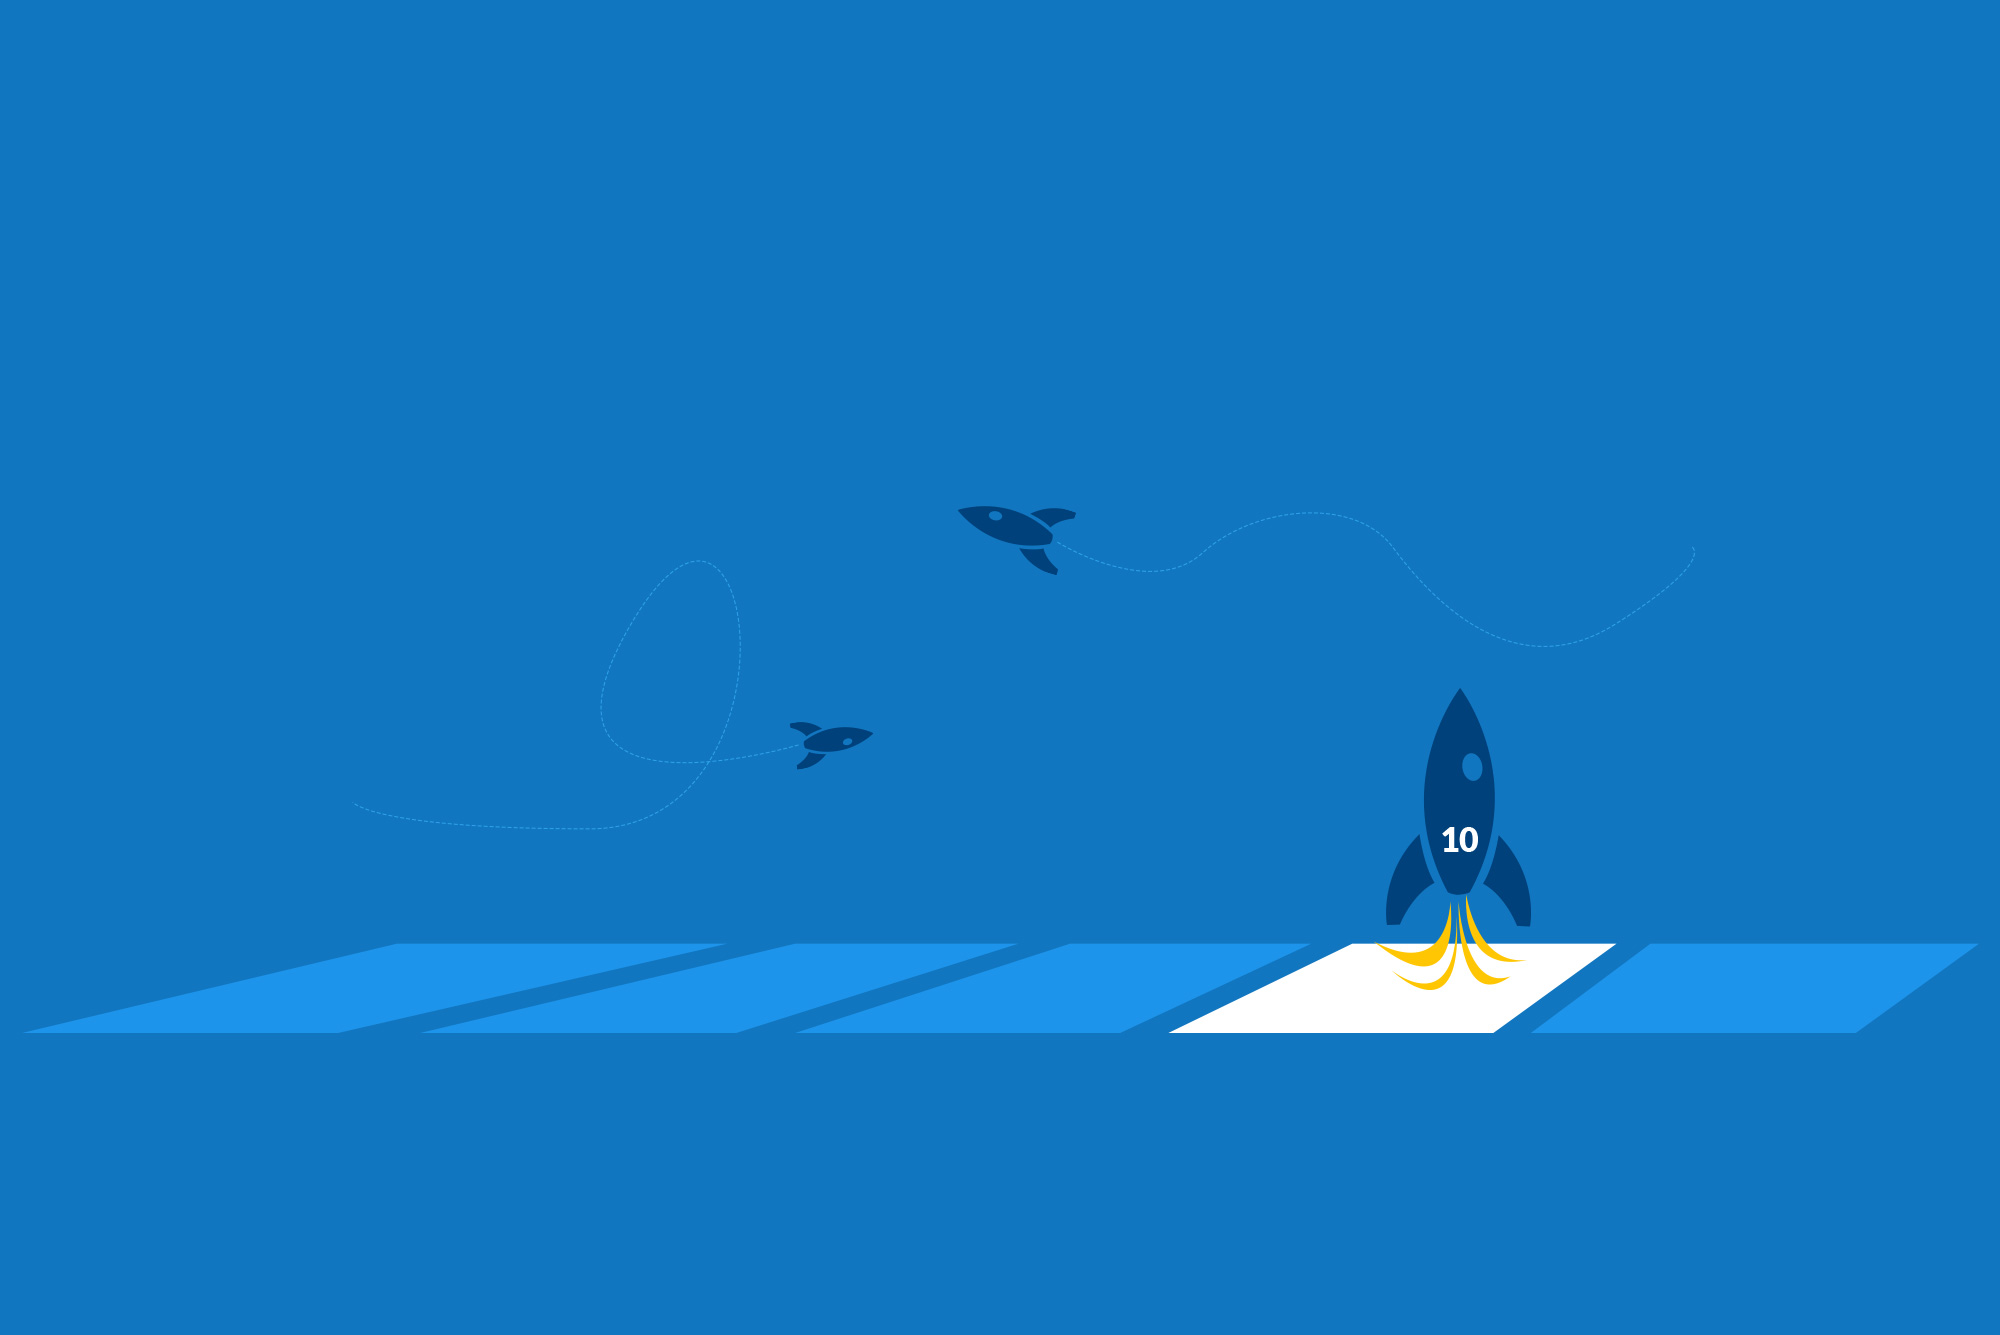 Rocket landing on blue background - Homepage is dead